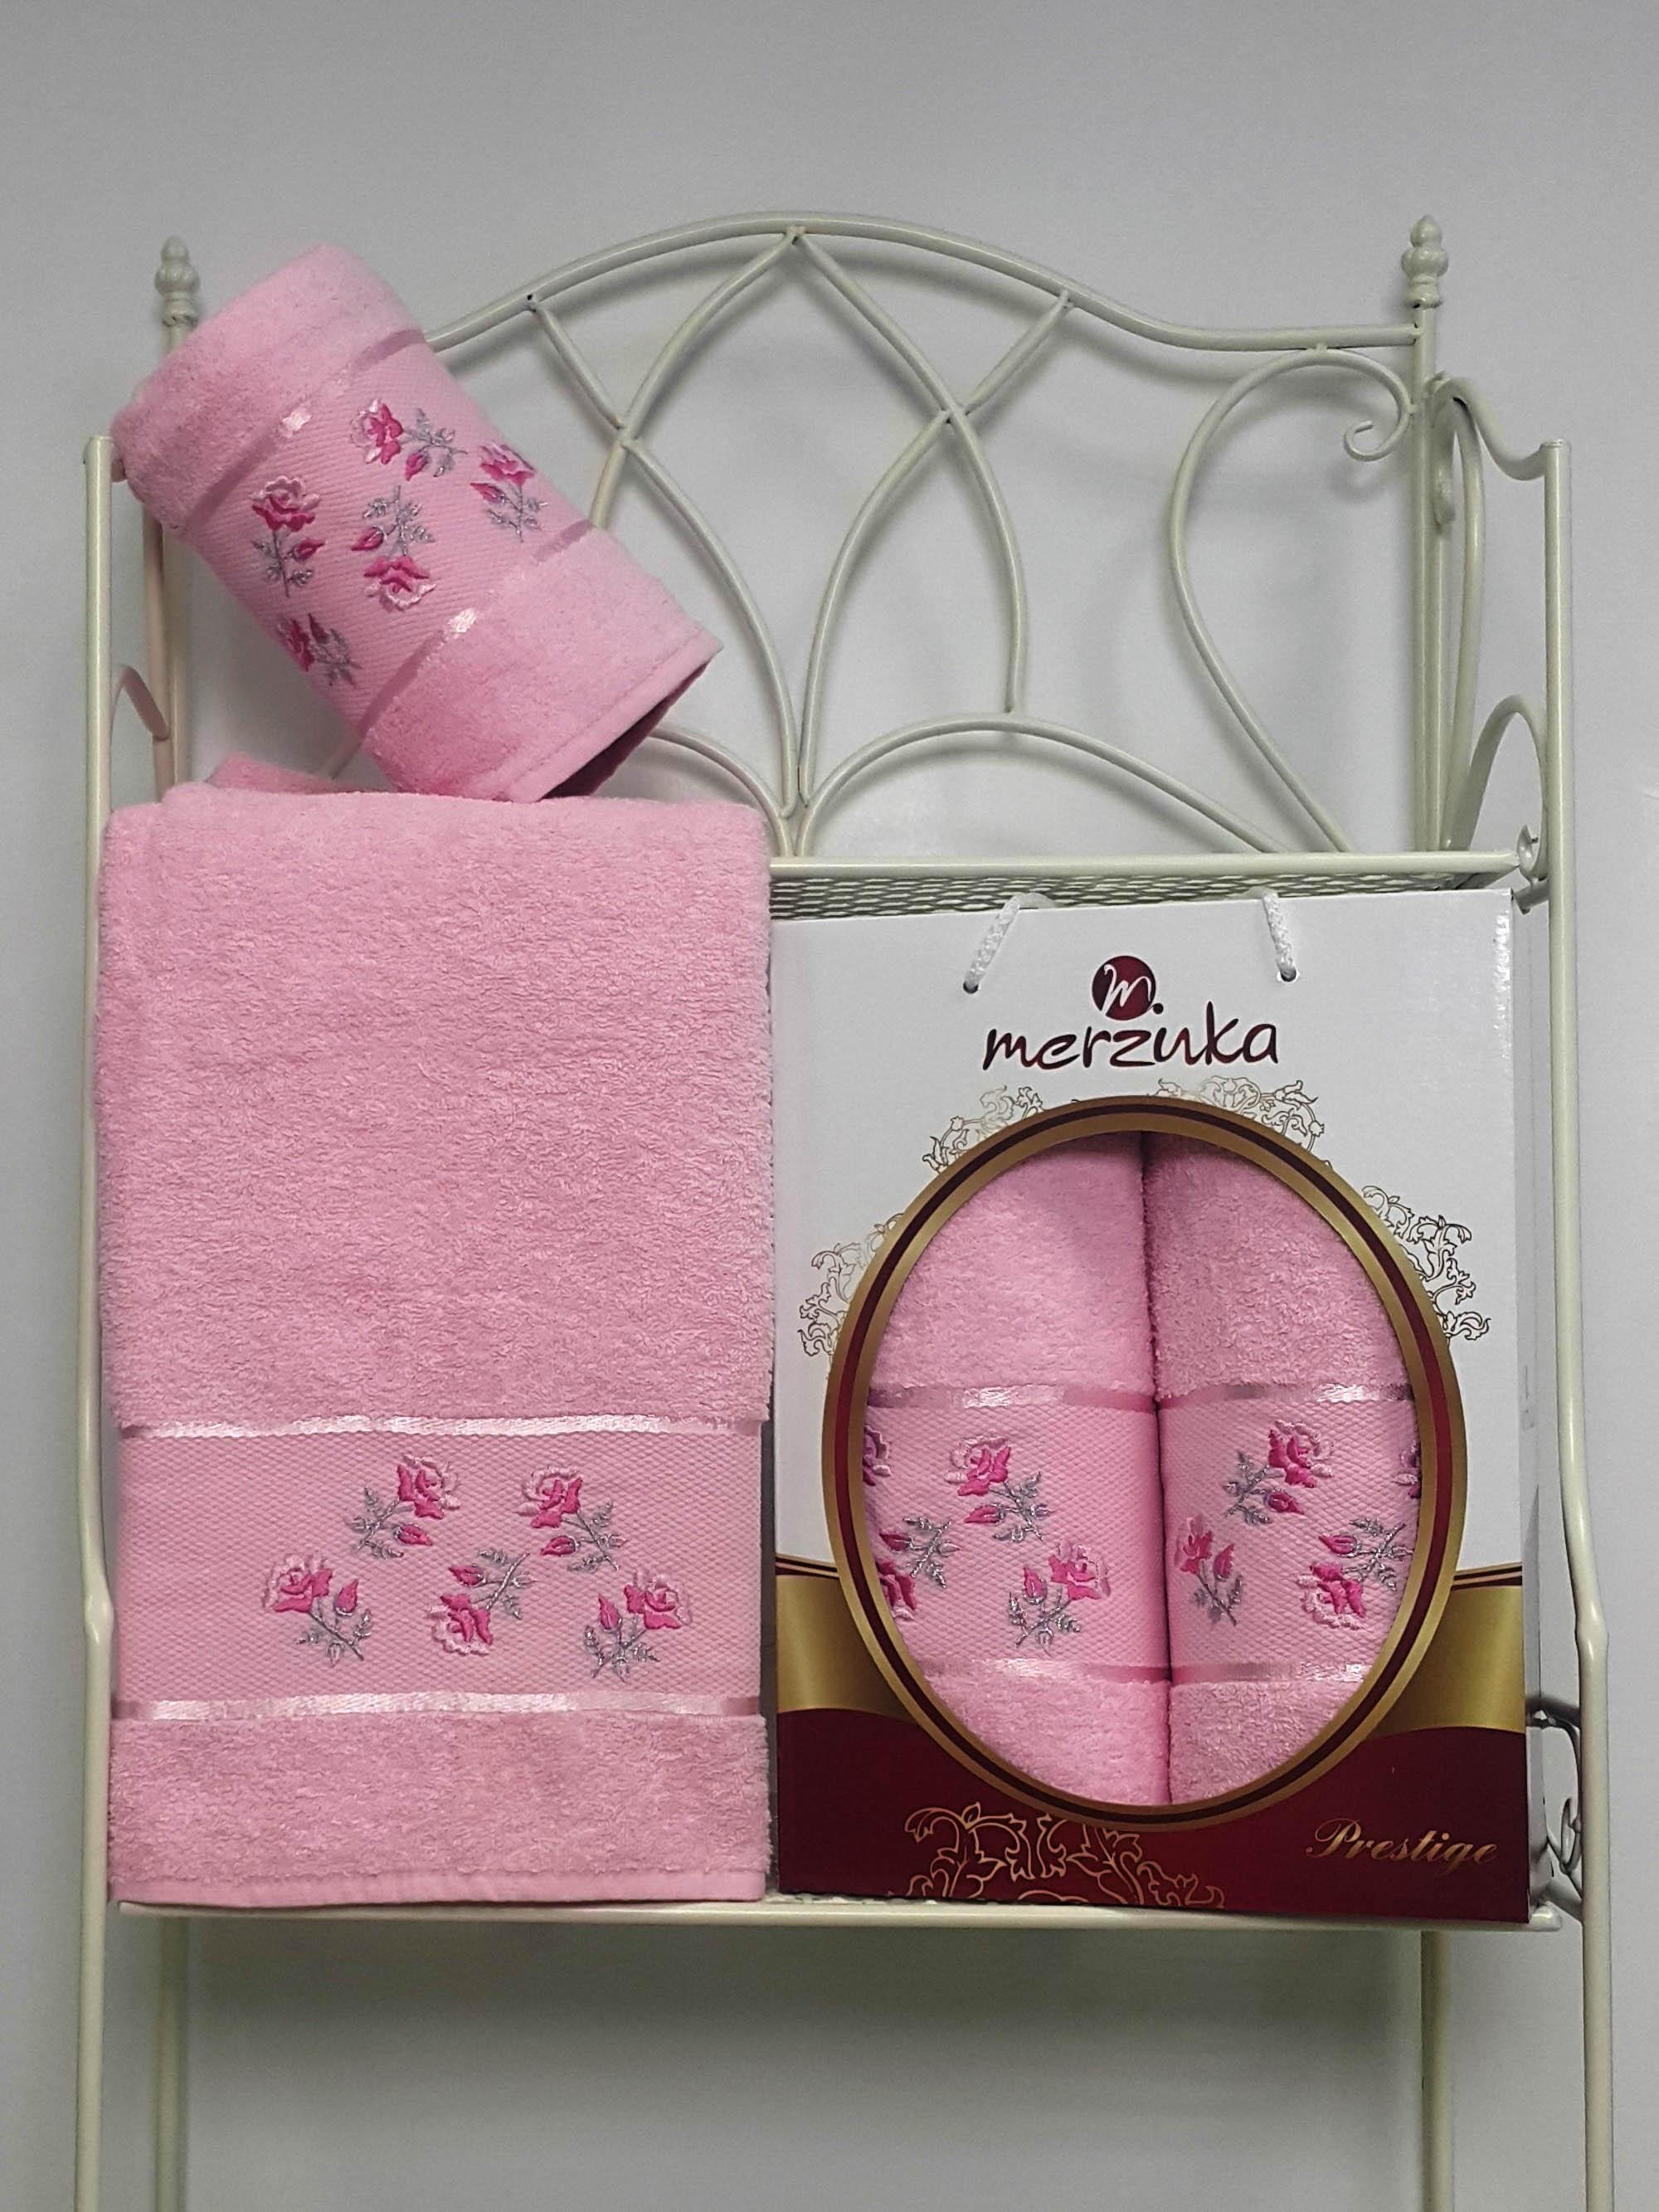 Полотенца Oran Merzuka Набор из 2 полотенец Prestij Цвет: Светло-Розовый набор из 3 полотенец merzuka sakura 50х90 2 70х140 8432 оранжевый